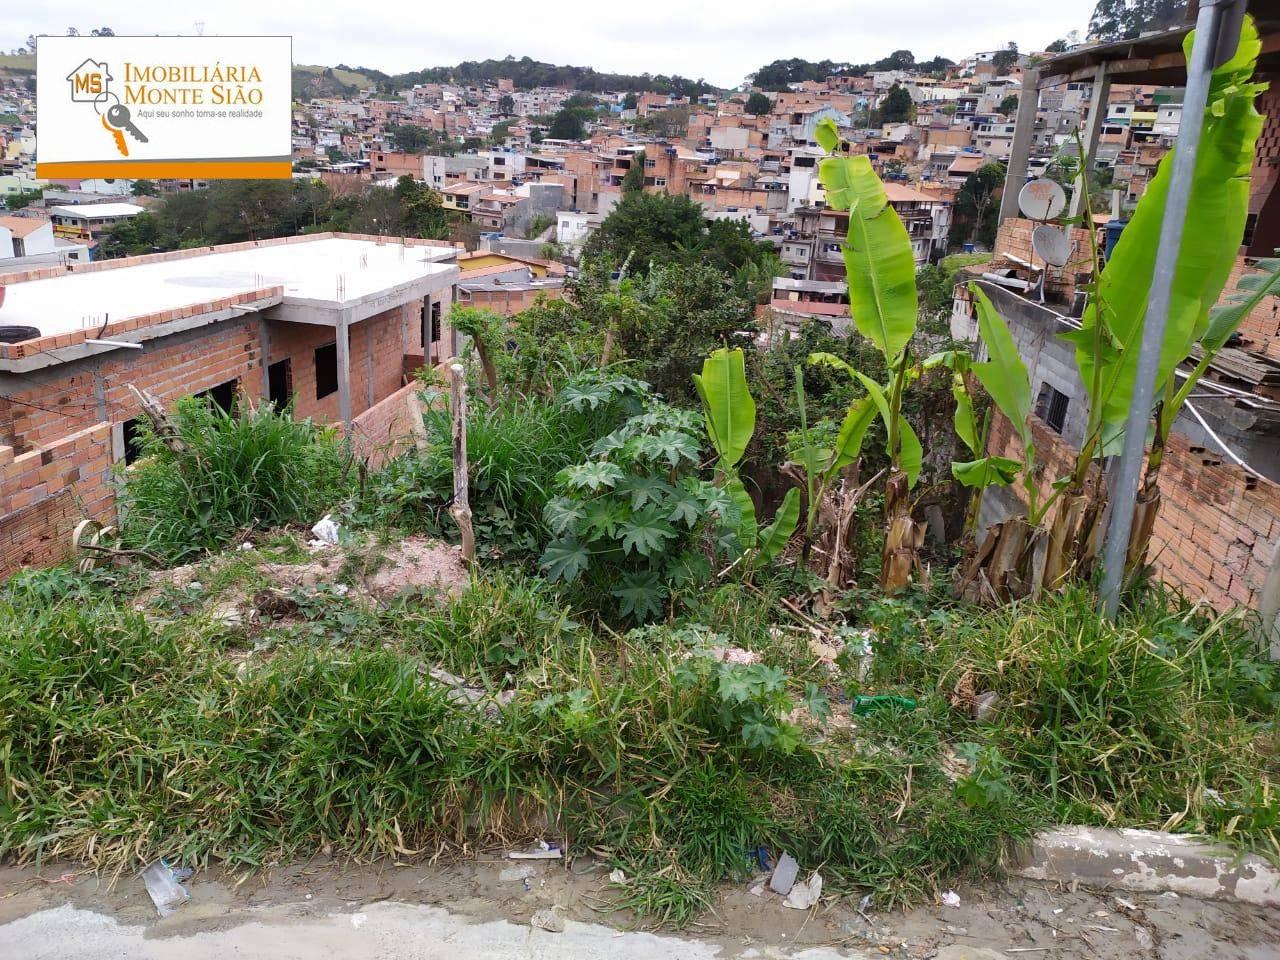 Terreno à venda, 250 m² por R$ 170.000 - Jardim Fortaleza - Guarulhos/SP